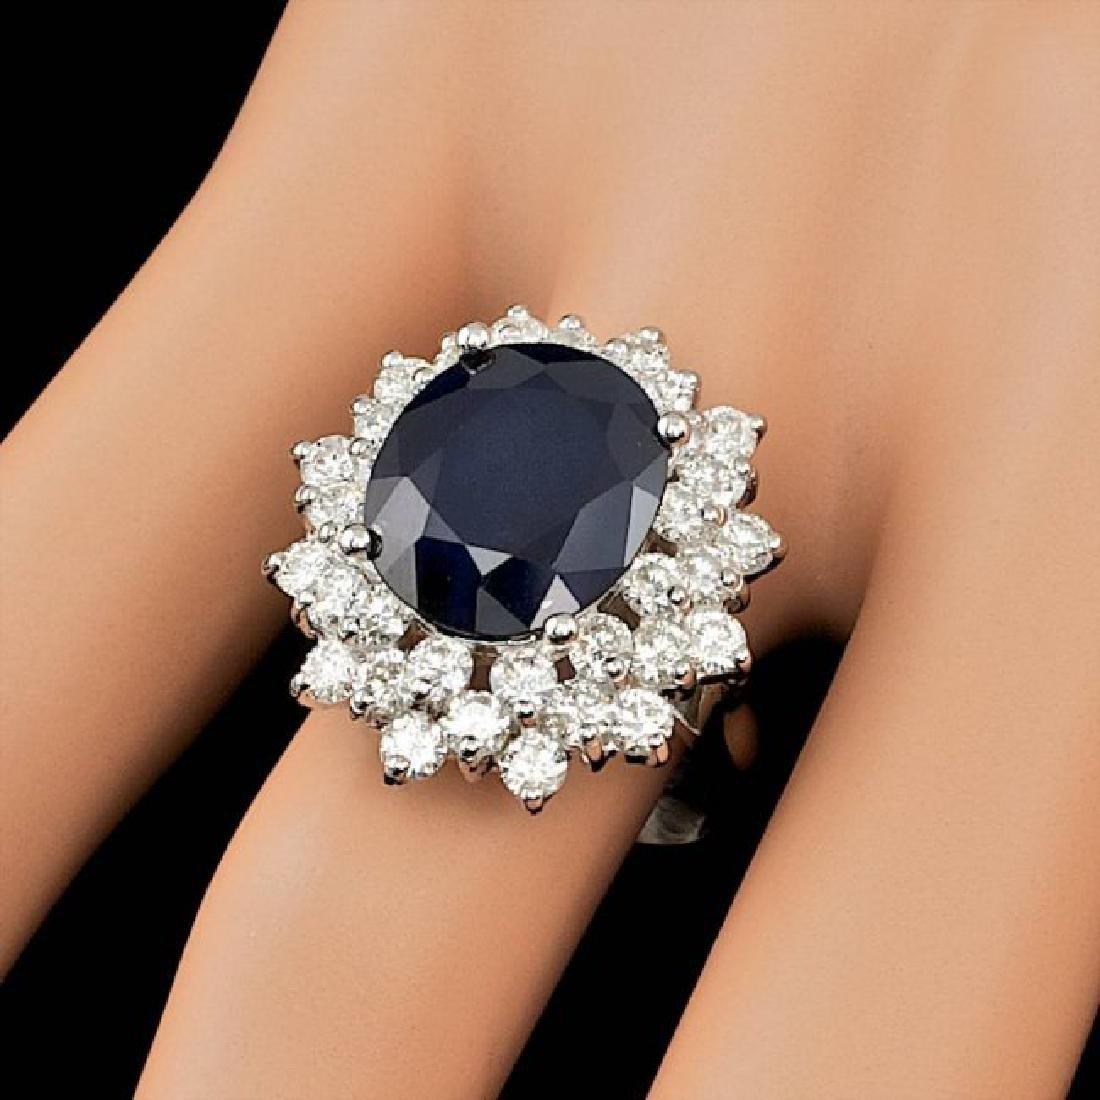 14k Gold 7.00ct Sapphire 2.55ct Diamond Ring - 4